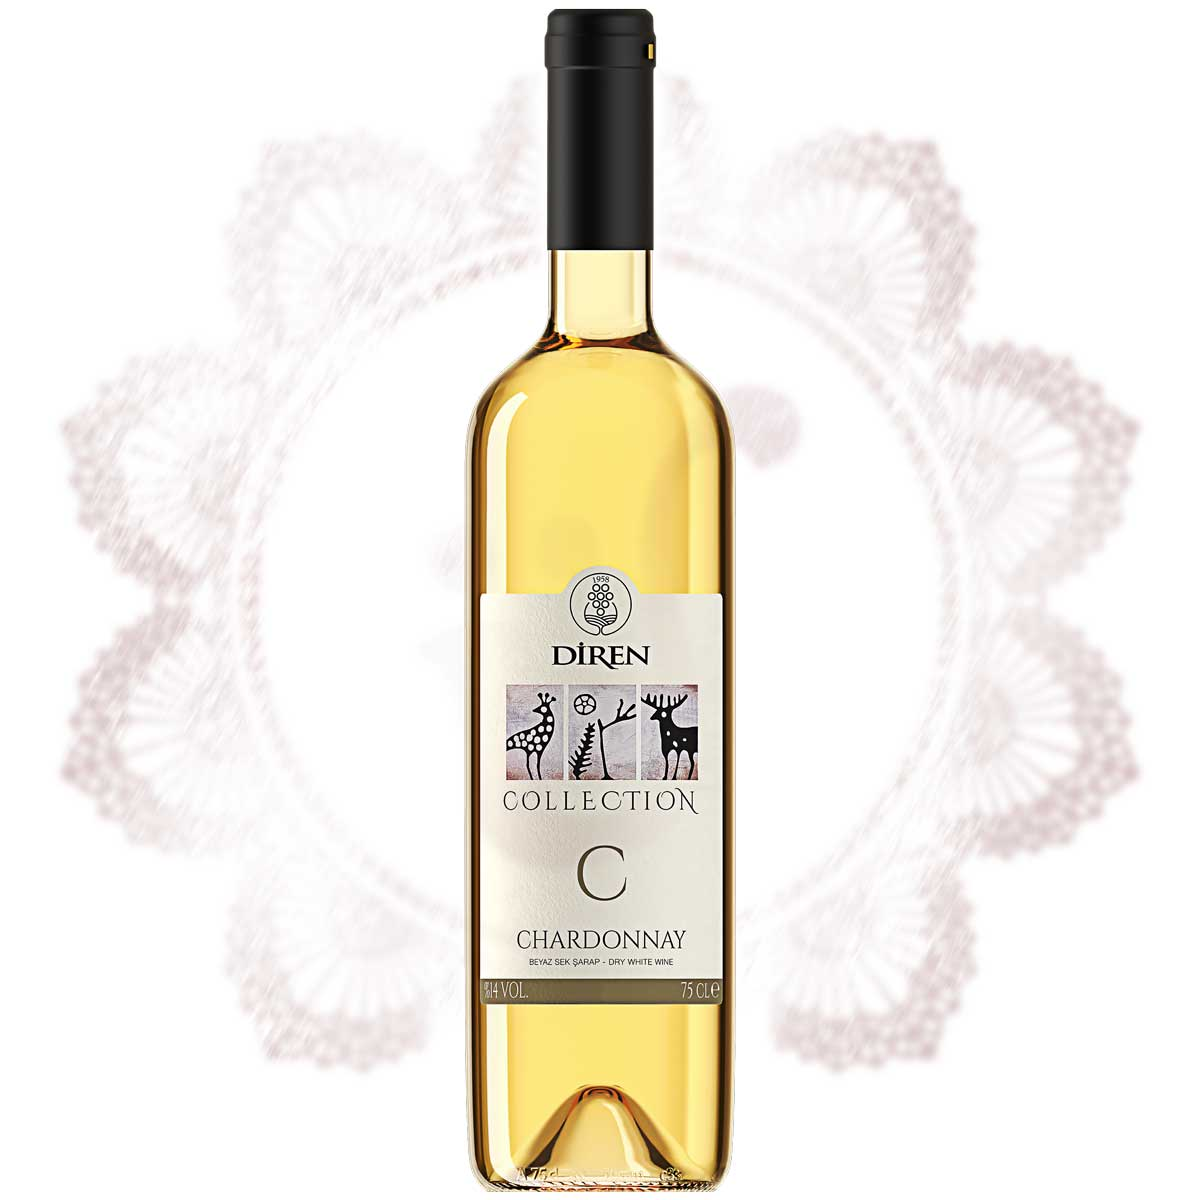 Diren Chardonnay Collection